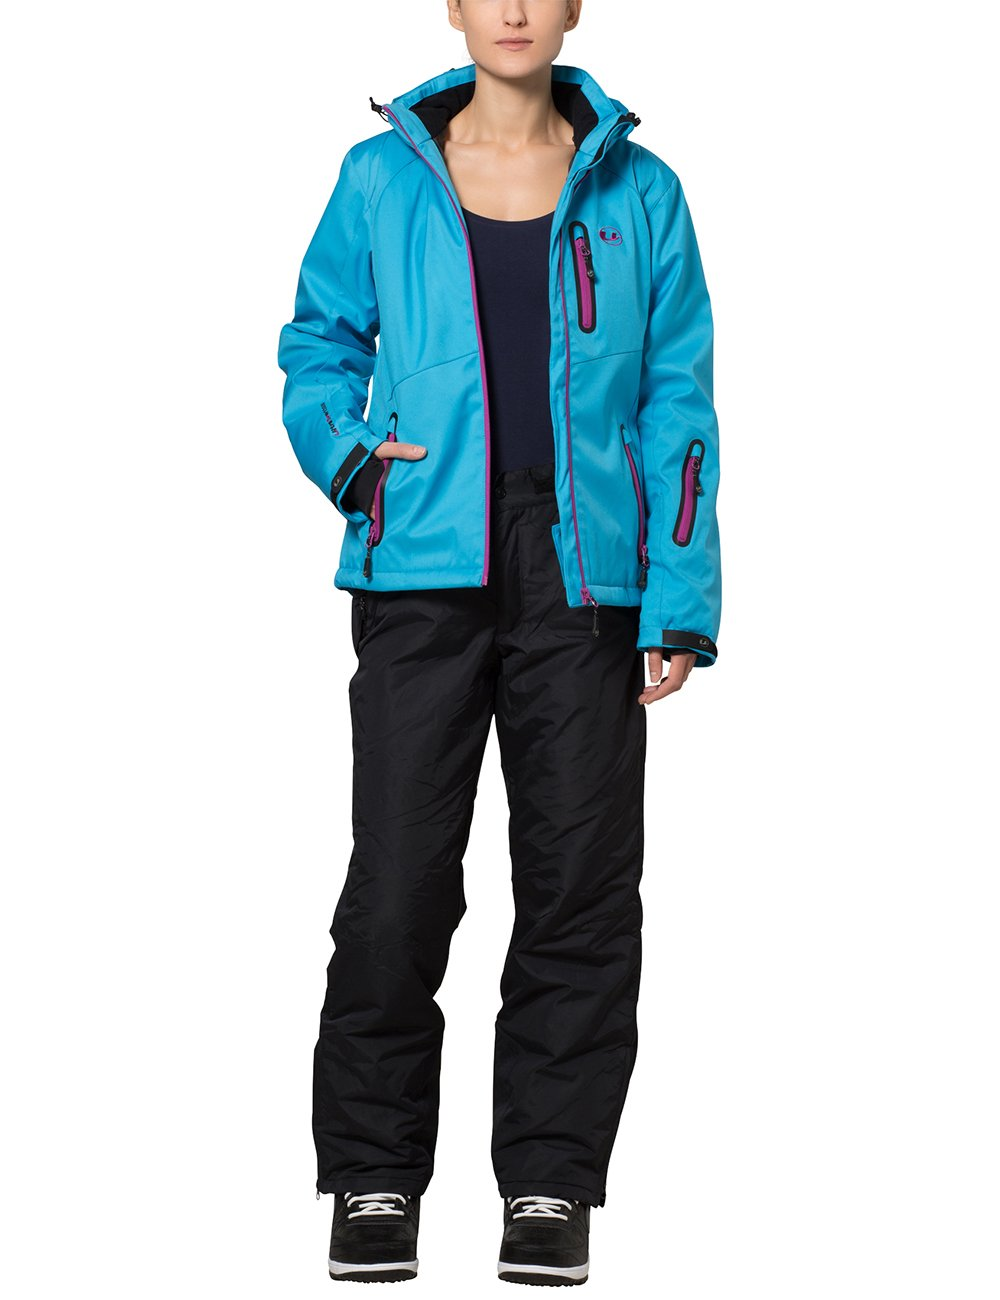 Ultrasport Arlberg Pantaloni da Snowboard//Sci Funzionali da Donna con Ultraflow 2.000